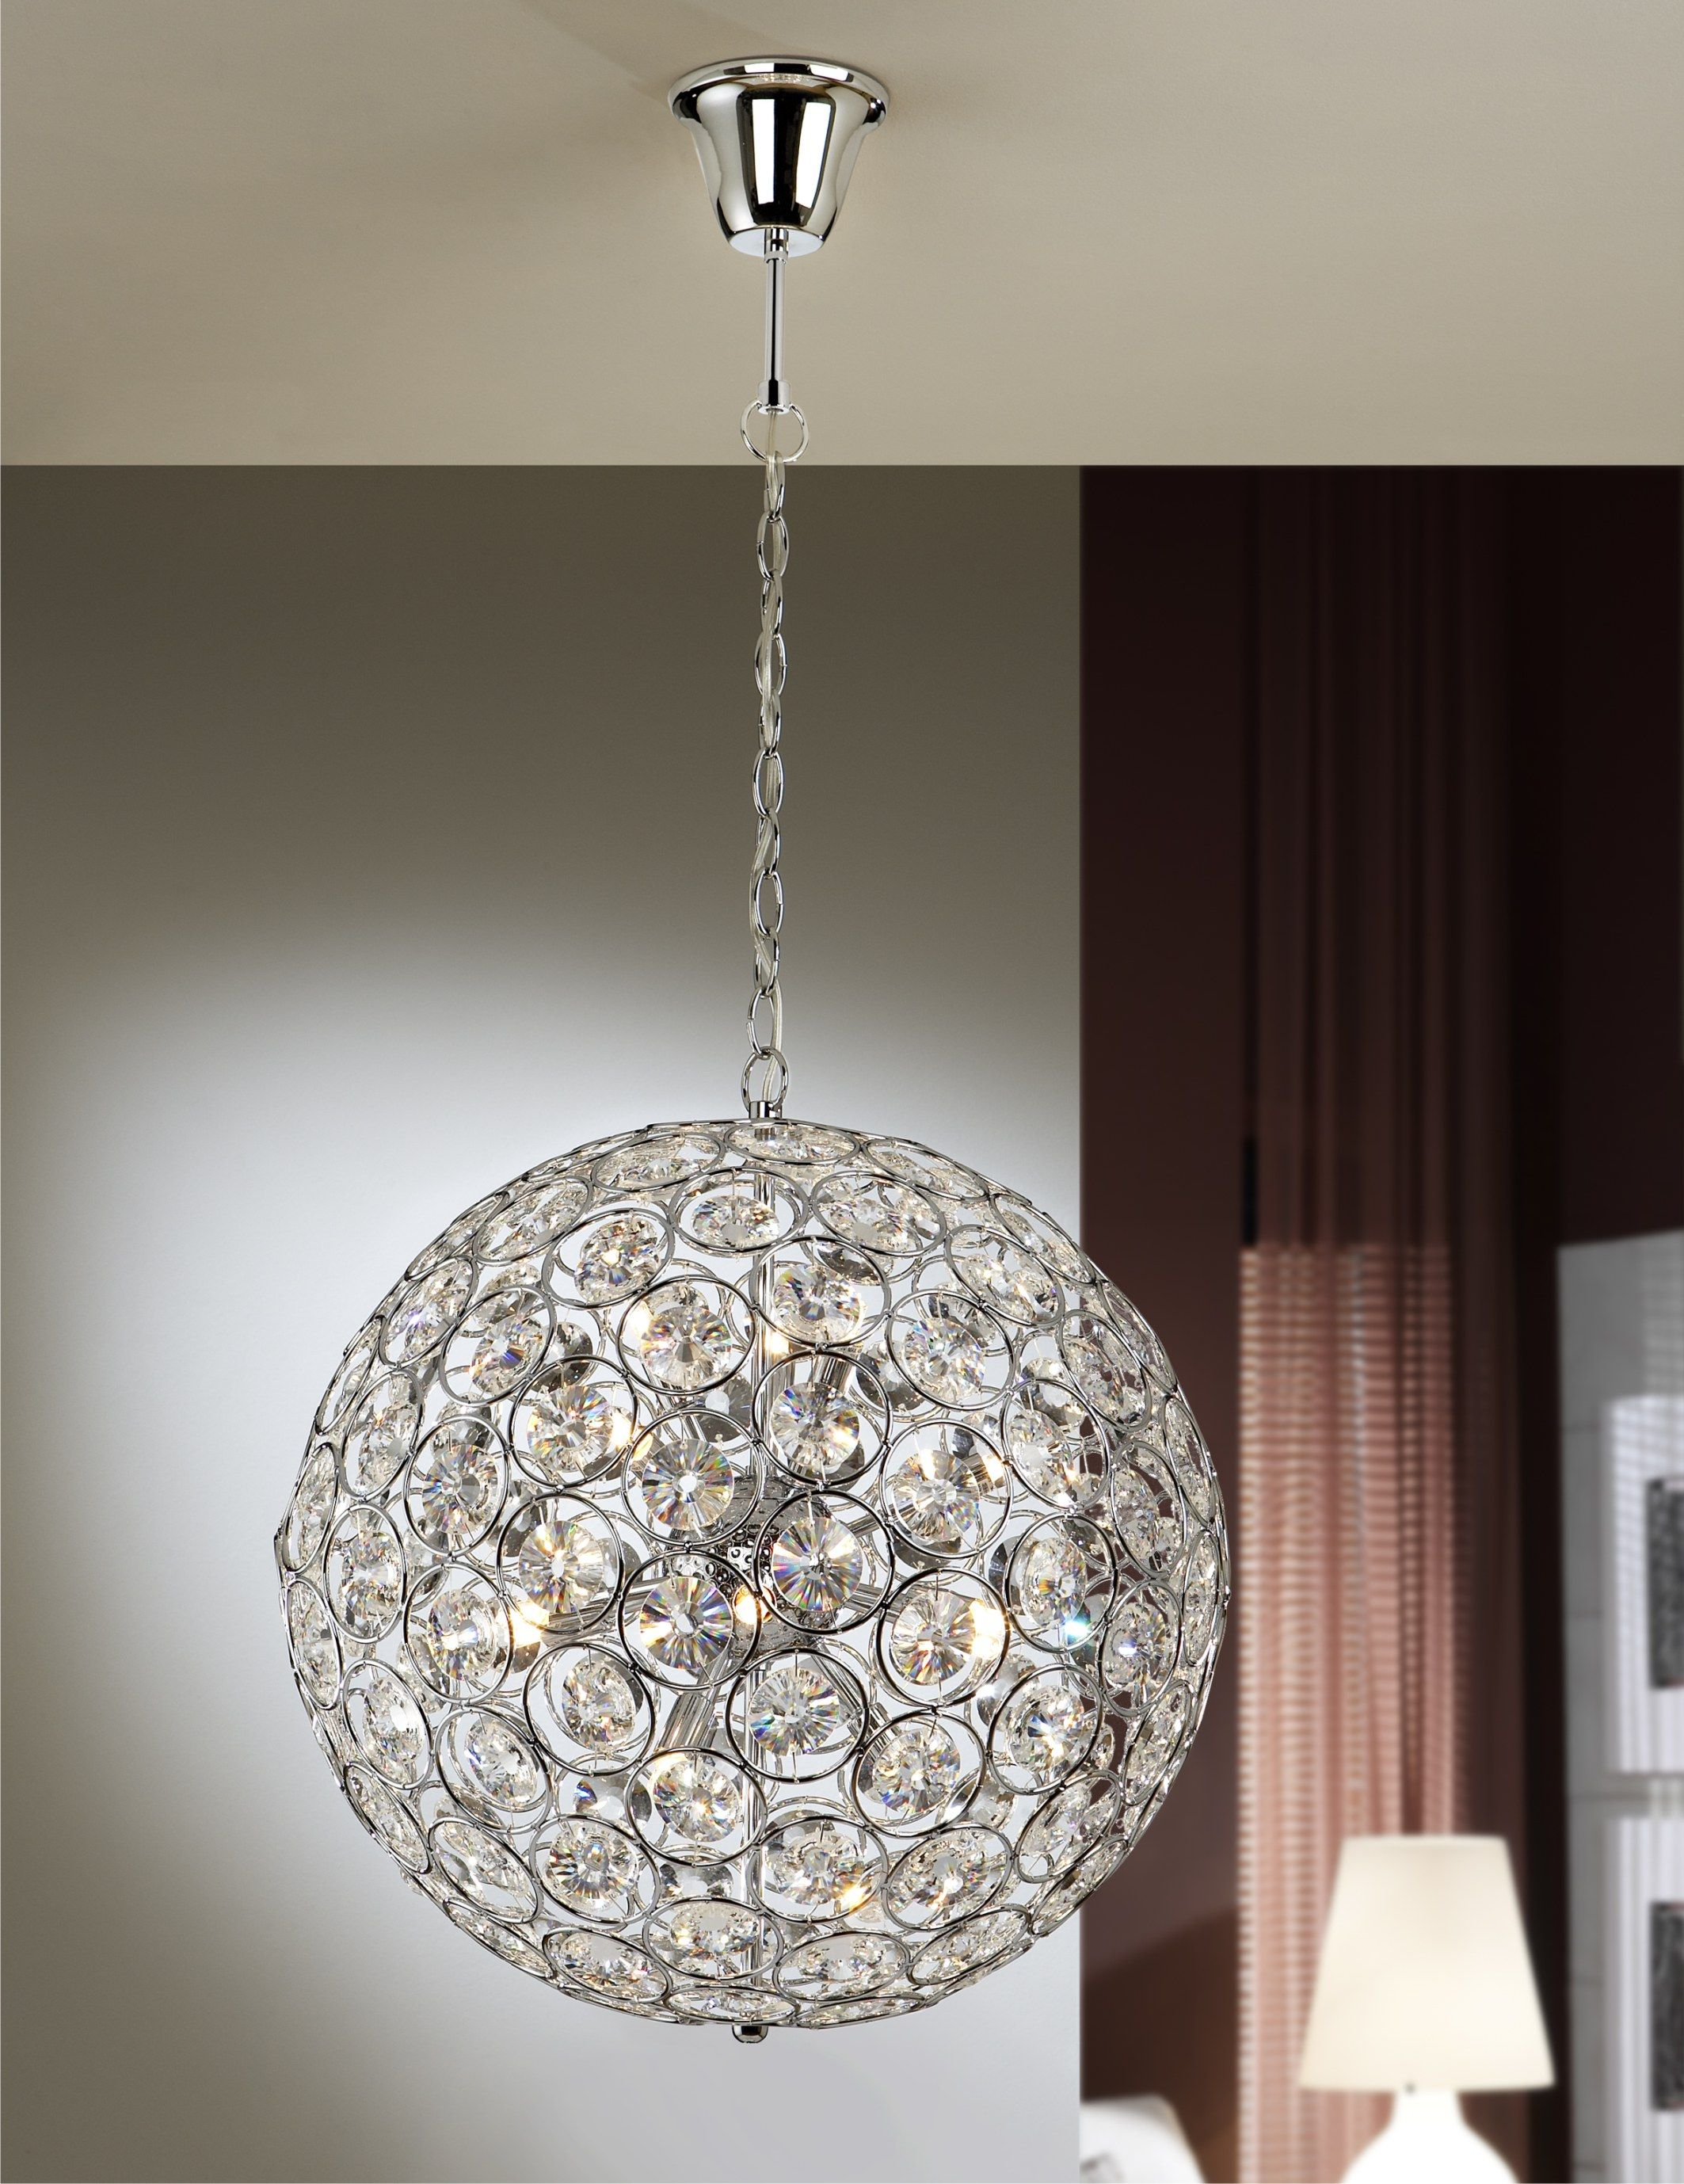 L mpara luppo schuller iluminaci n ceiling lights - Lamparas schuller ...